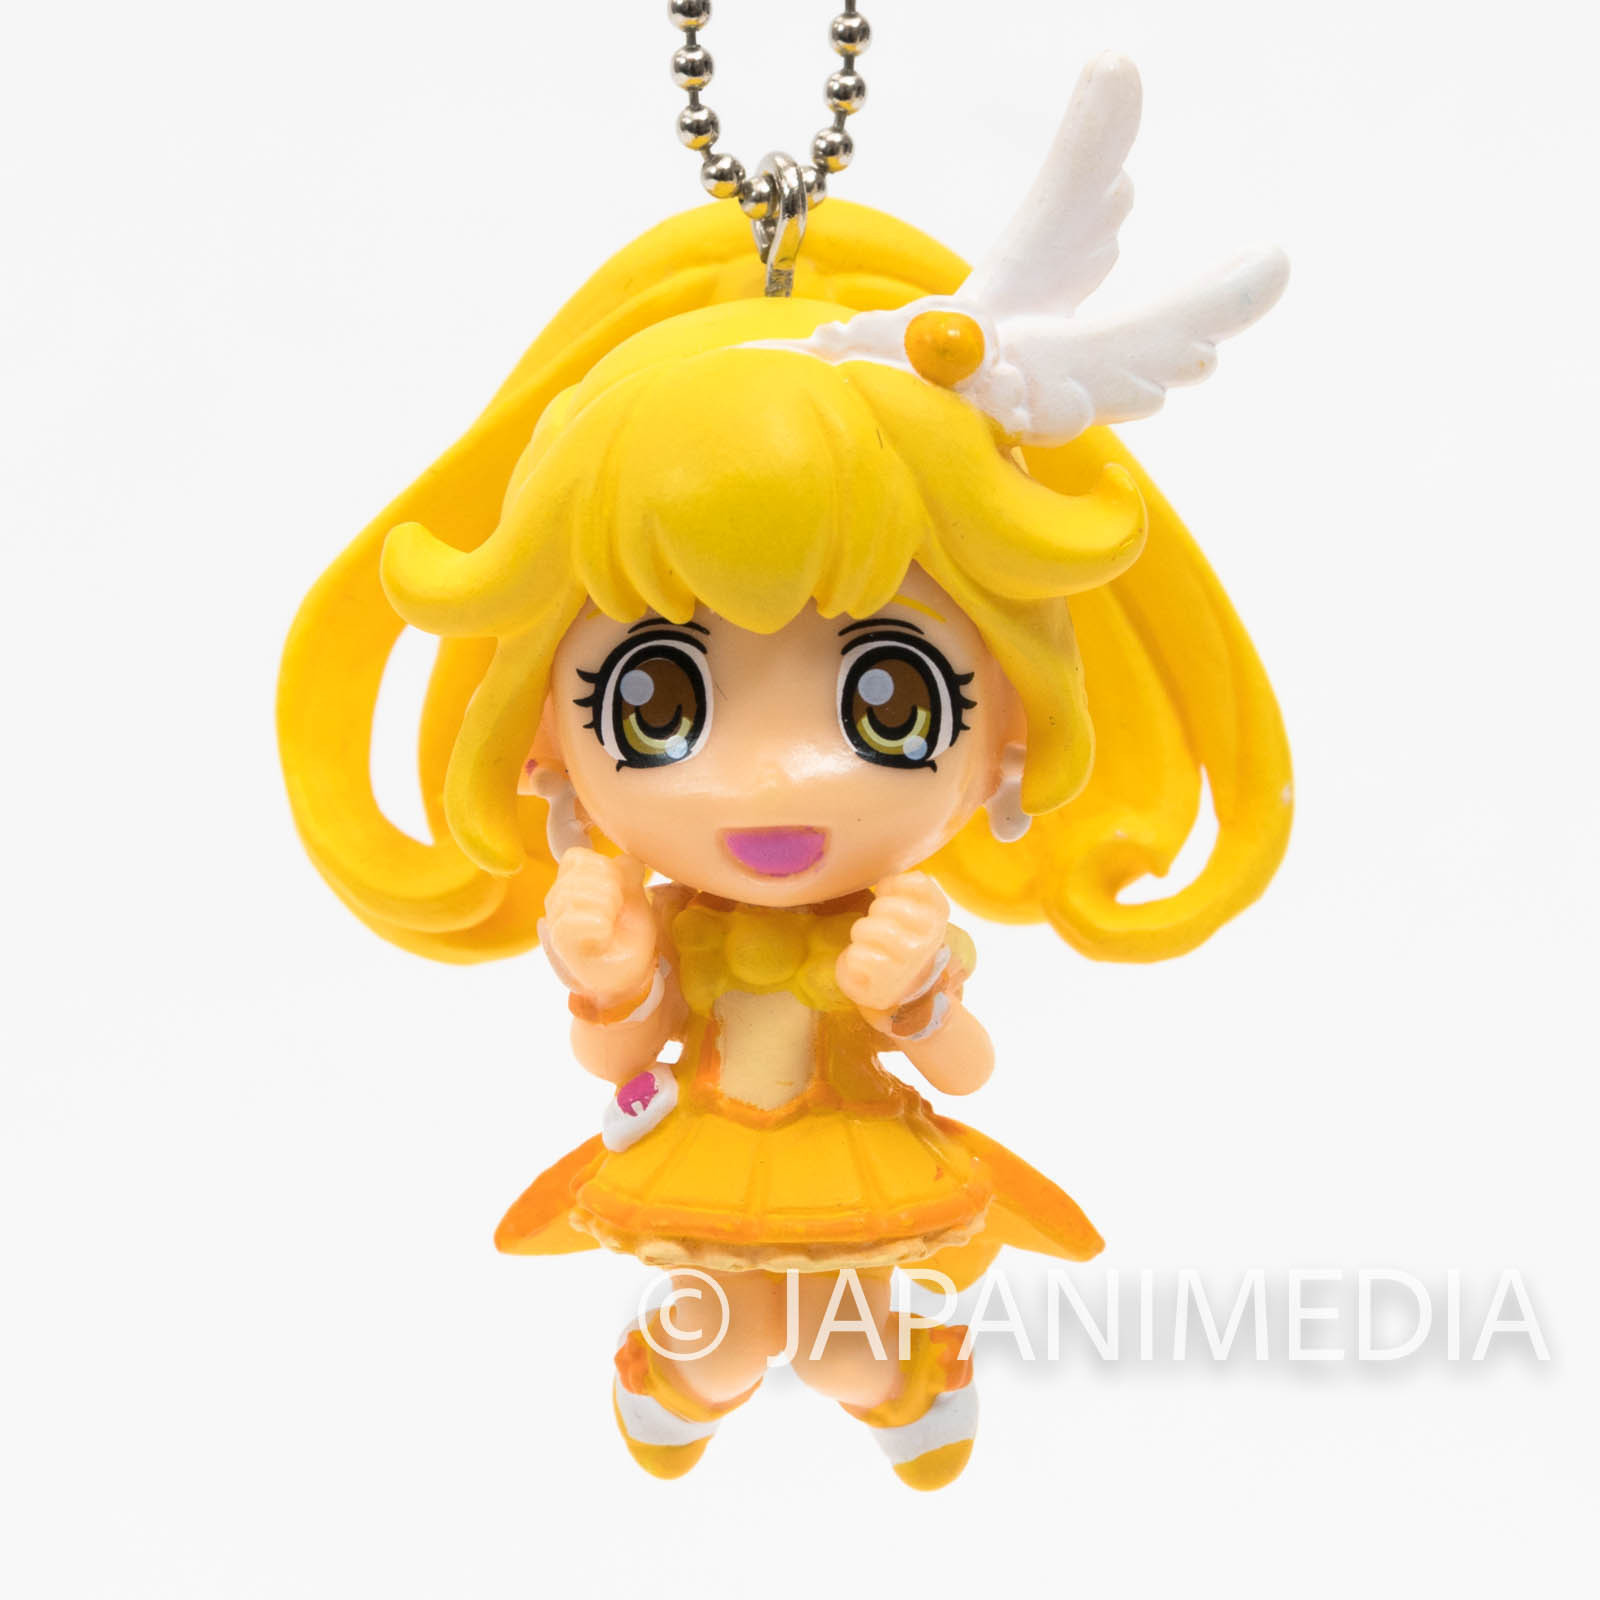 Smile PreCure! Cure Peace PreCure Mascot Figure Ball Keychain JAPAN ANIME